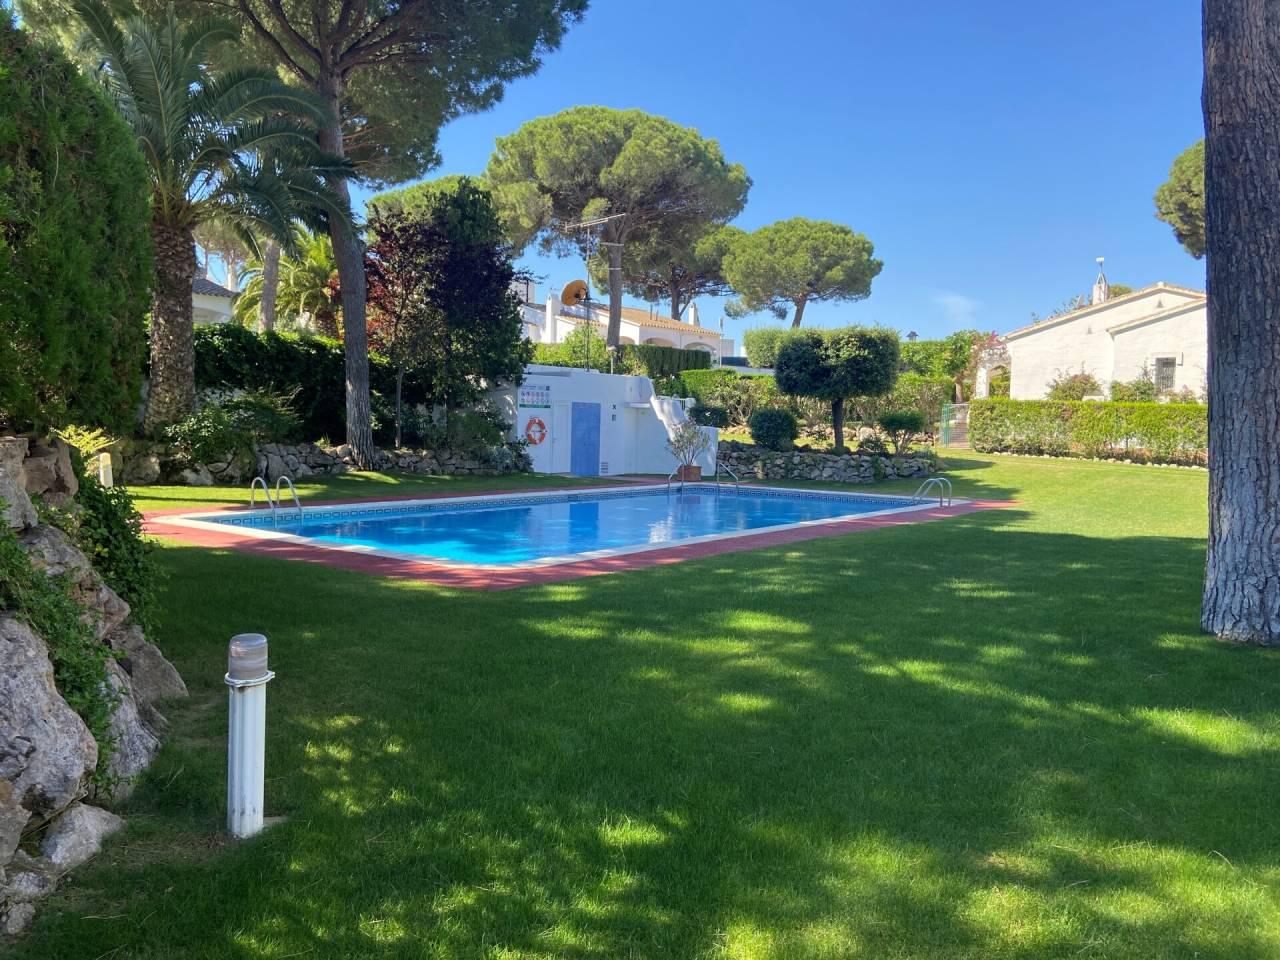 005060 - ROGER DE FLOR House with community garden and pool in L'Escala, Costa Brava